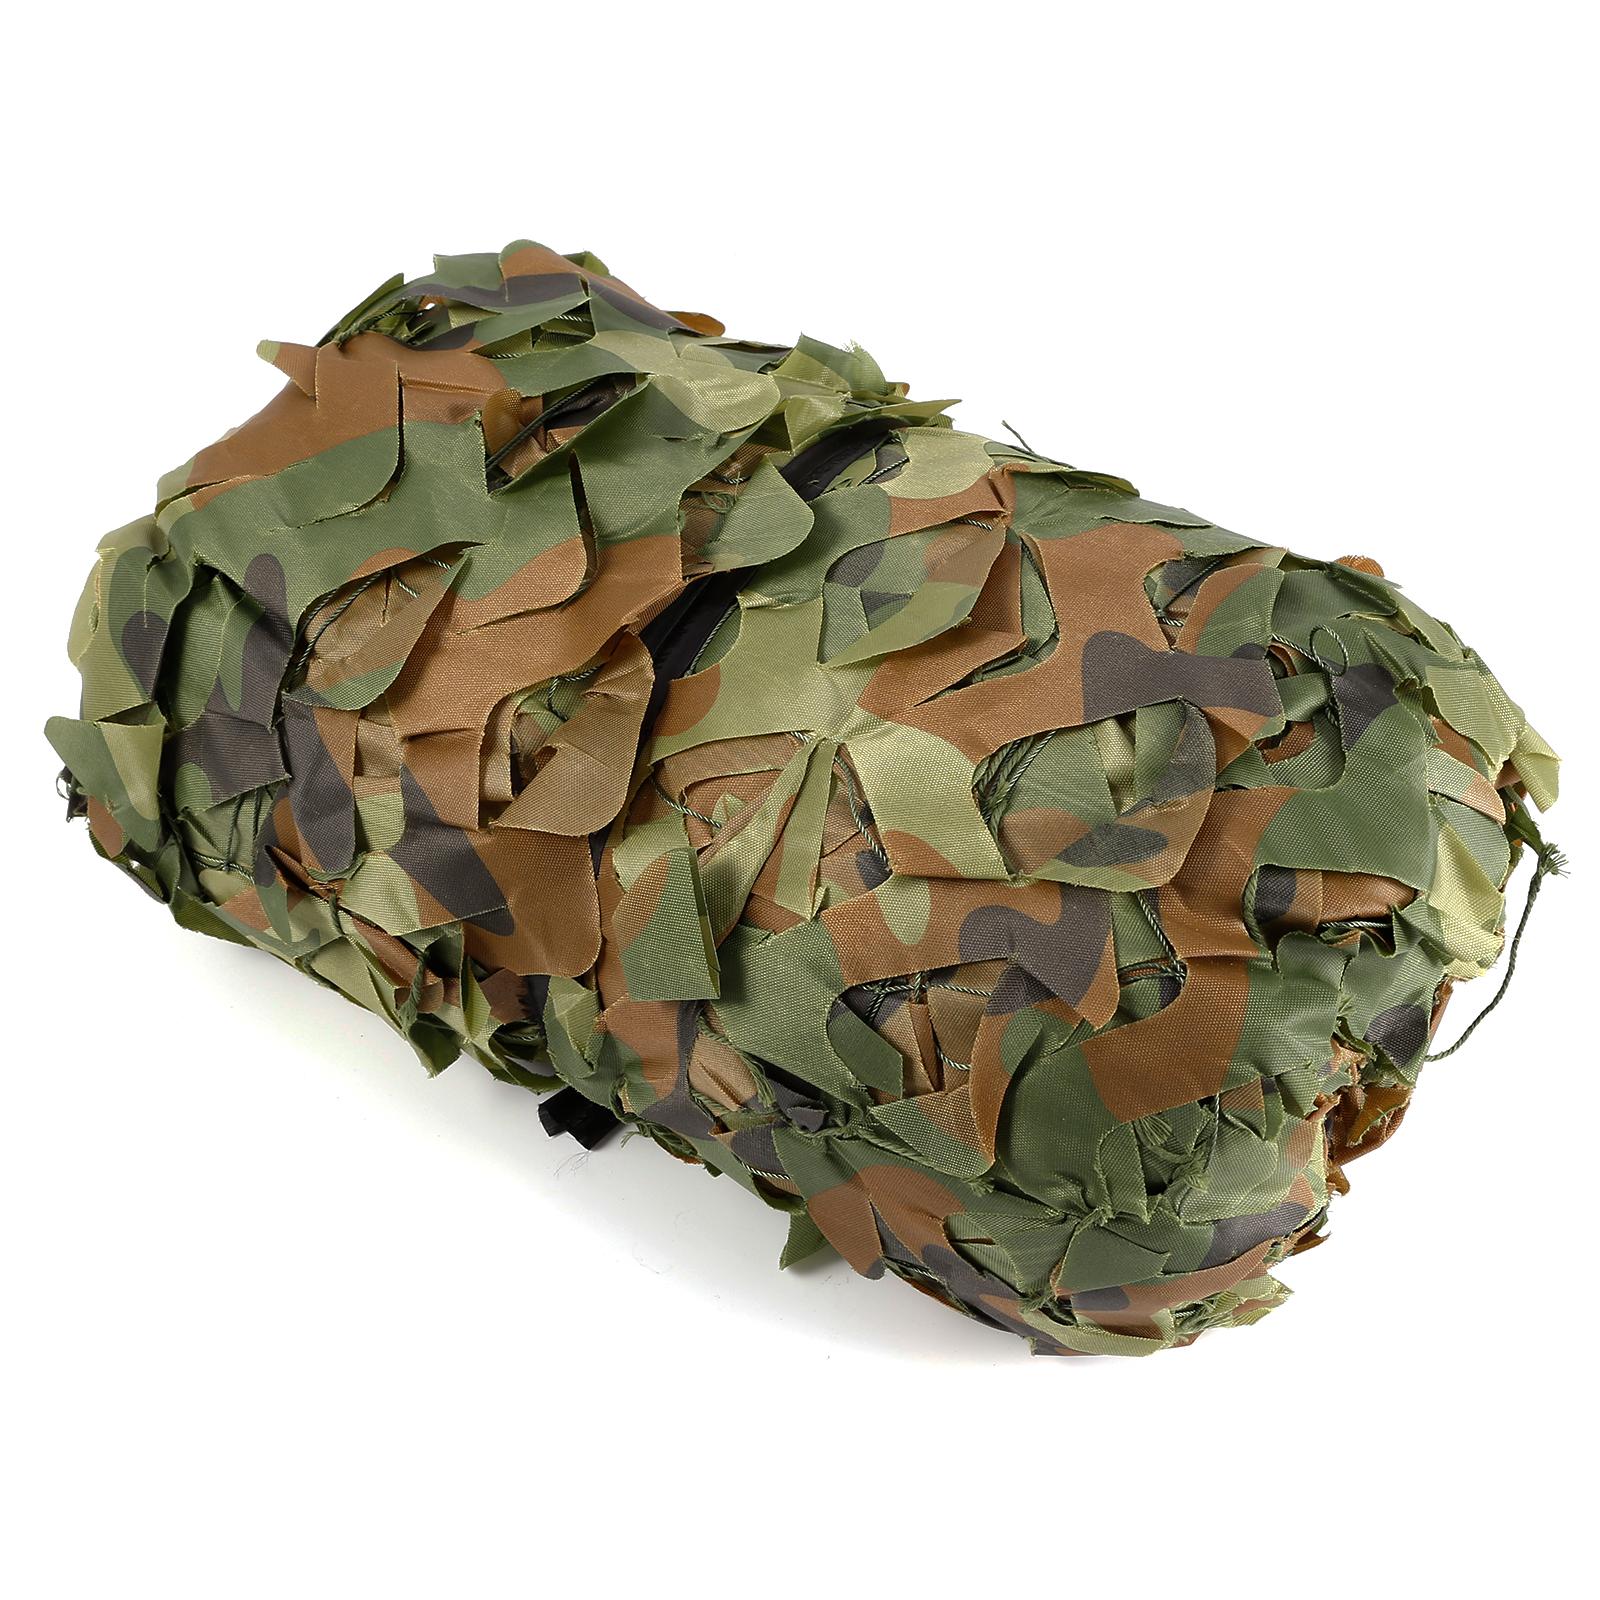 Tarnnetz flecktarn Bundeswehr Tarnung Armee Army Camo Netz Tarnung Mega Größe